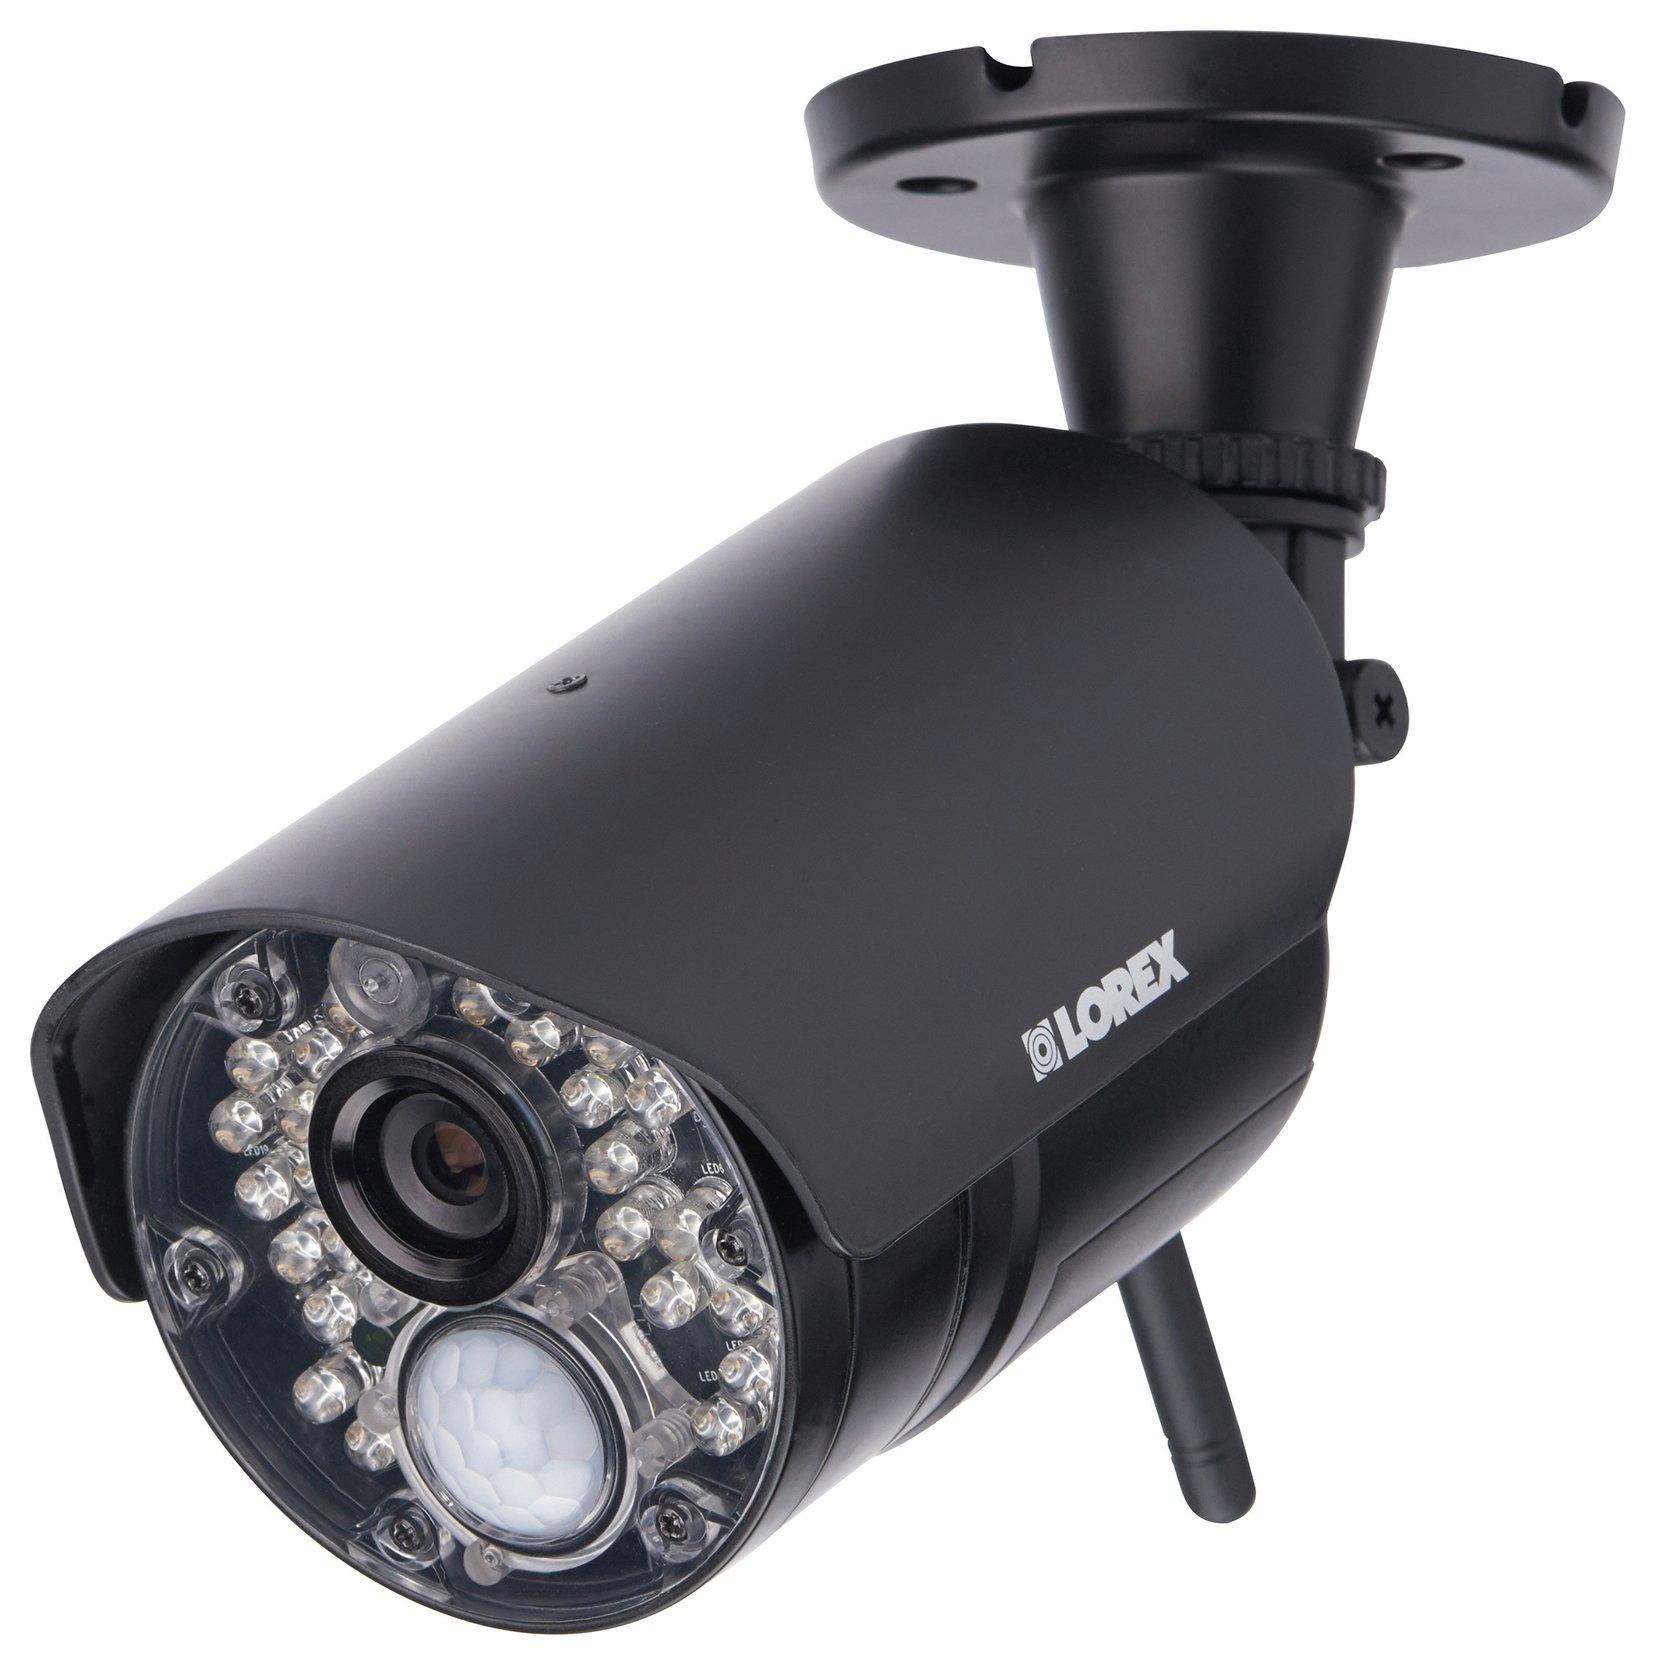 Lorex LW2770HAC1P Add-on CCTV Camera